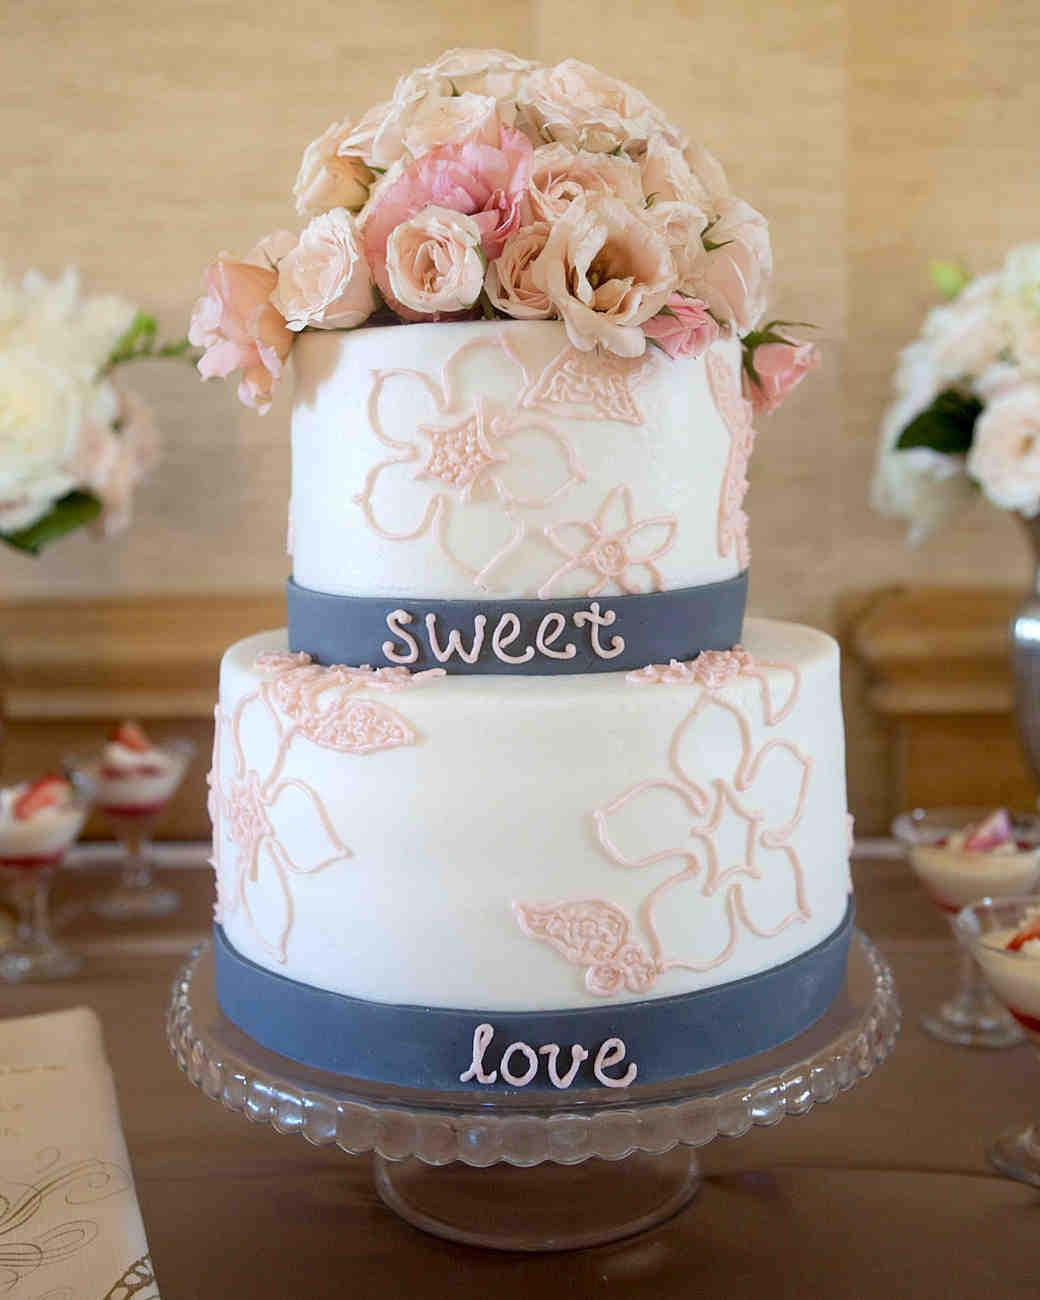 rw-anne-josh-cake-wd106057.jpg